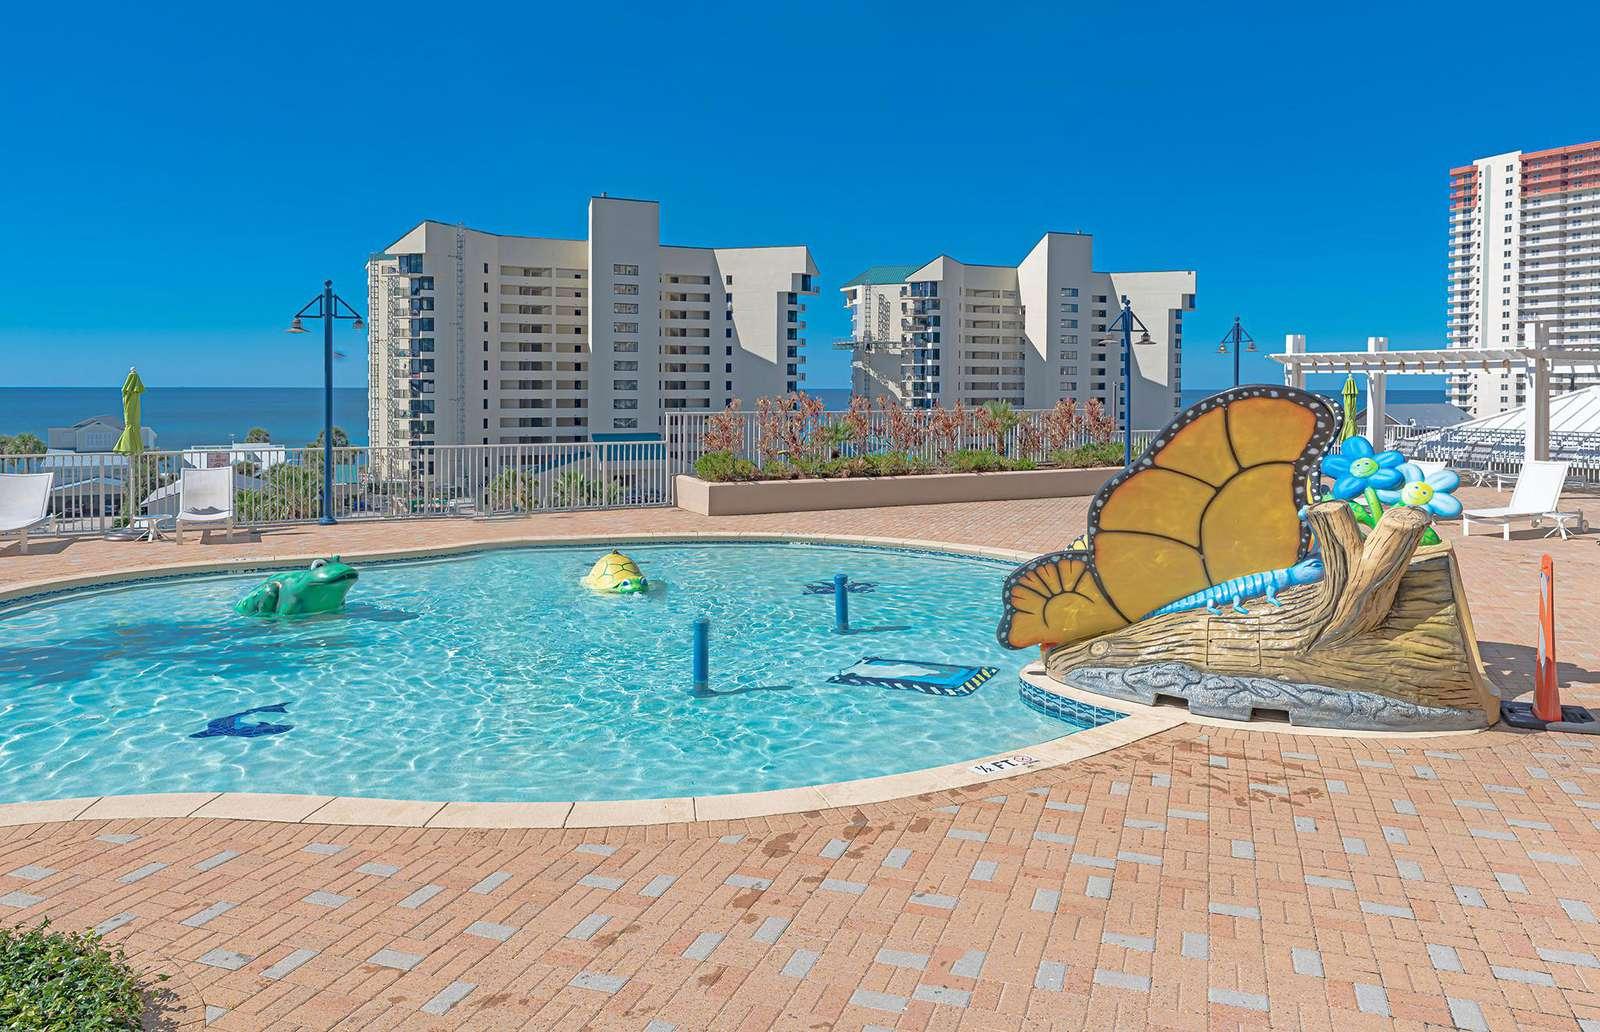 The children's Splash Pad will ensure great memories!